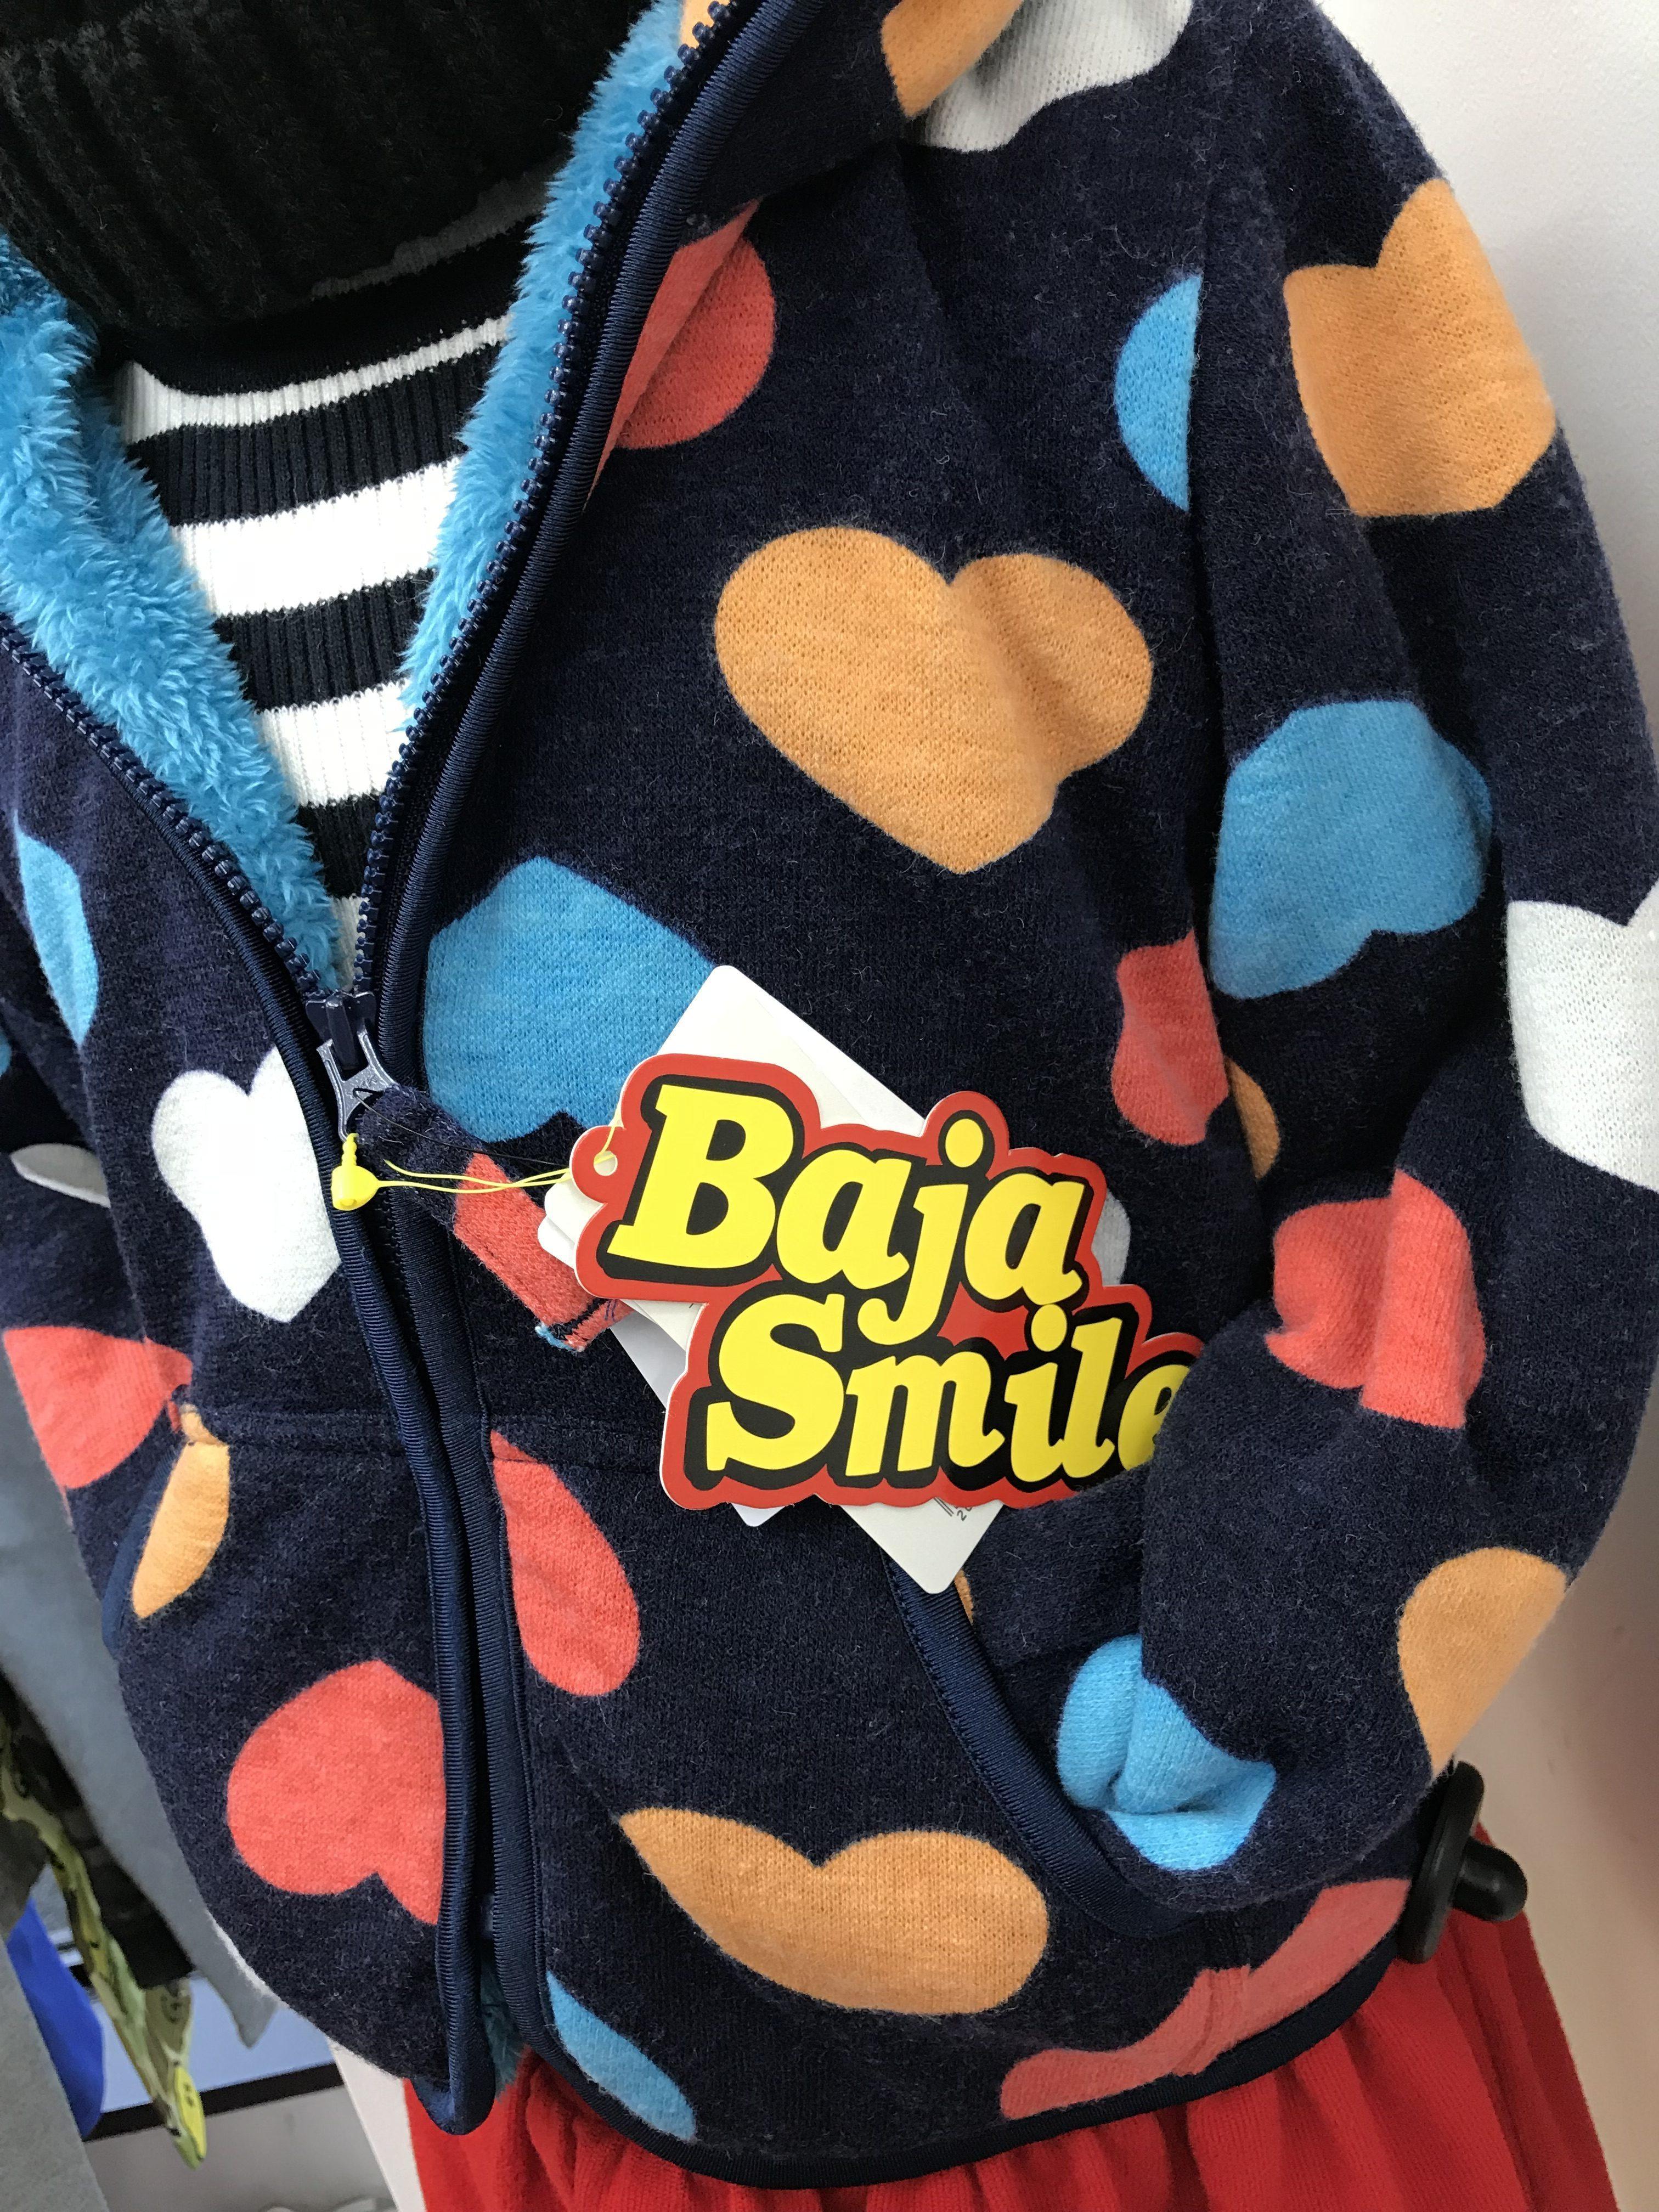 KID'S Baja Smile パーカー 福井県越前市 鯖江市 出張 出張買取 サンステッププラス越前店